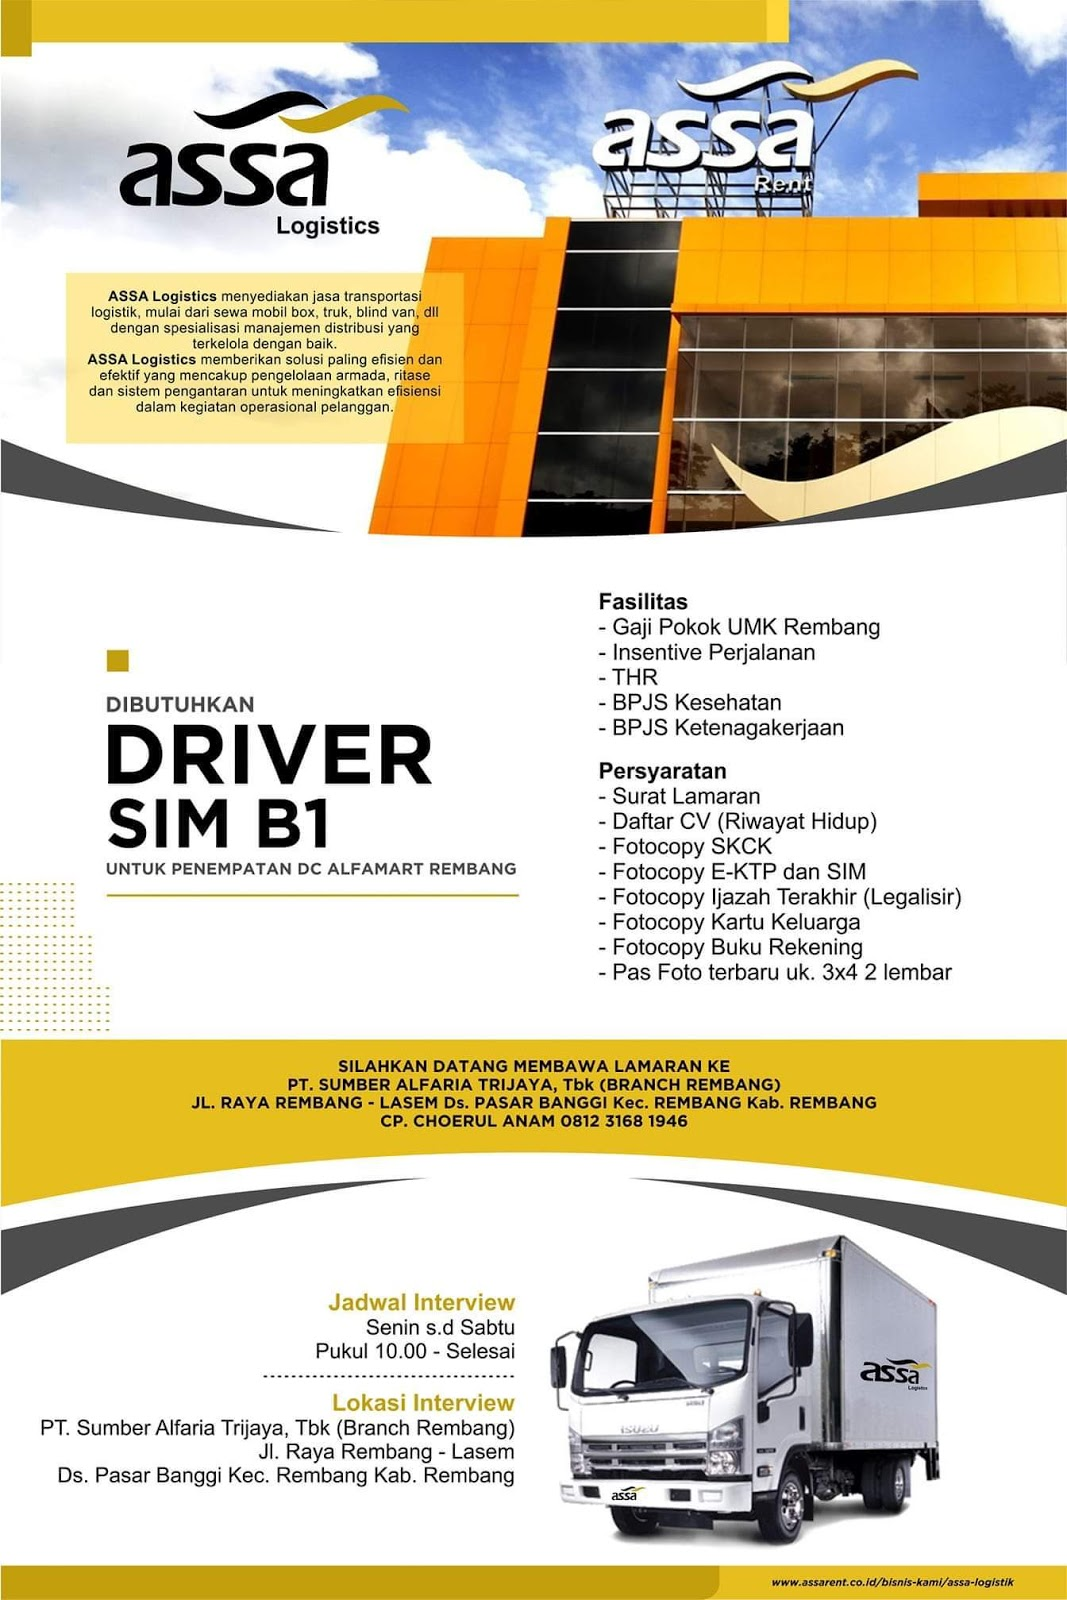 Lowongan Kerja Pt Adi Sarana Armada Tbk Assa Rembang Driver Sim B1 Untuk Alfamart Loker Swasta